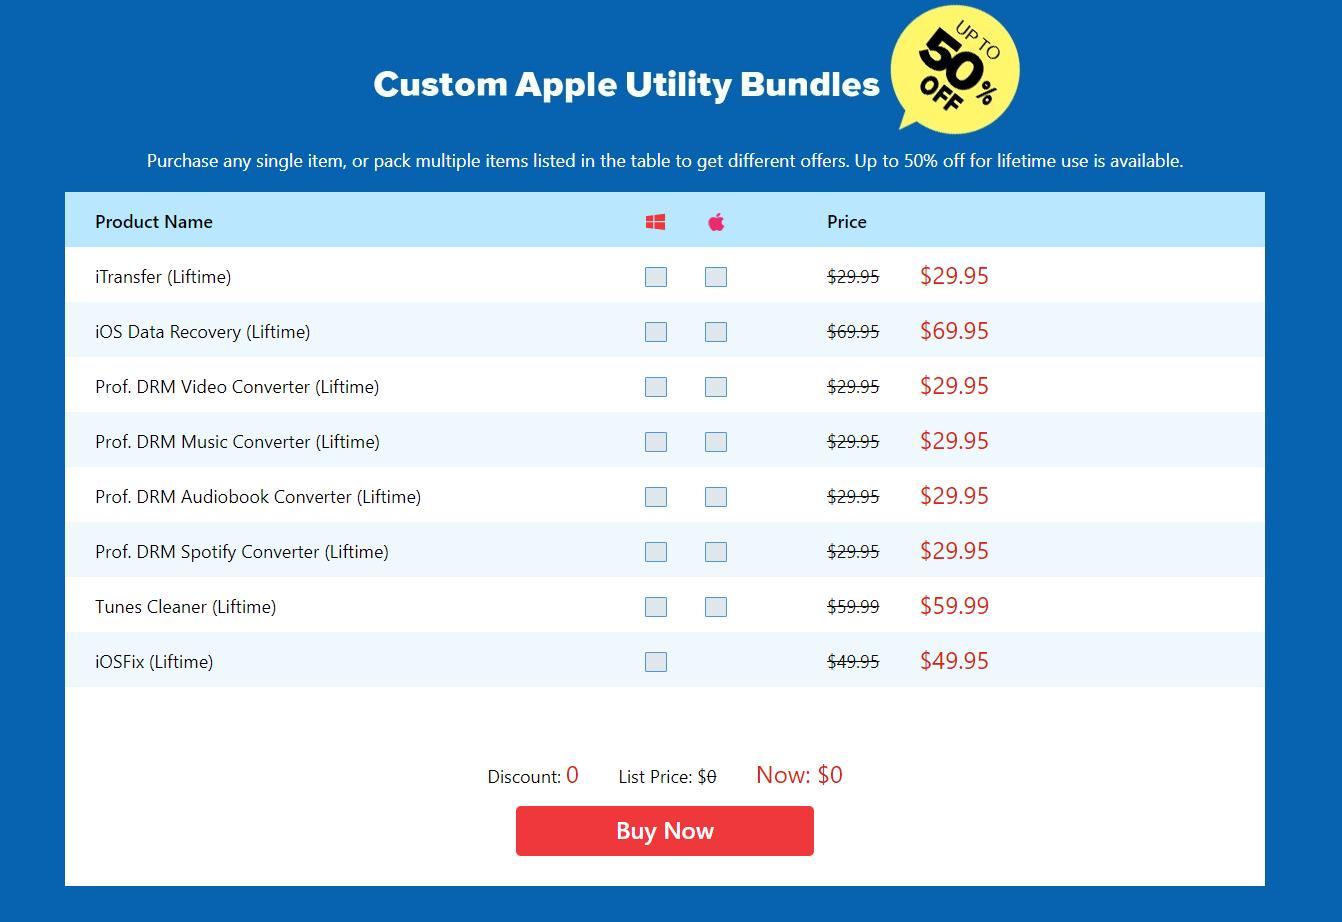 Custom Apple Utility Bundles